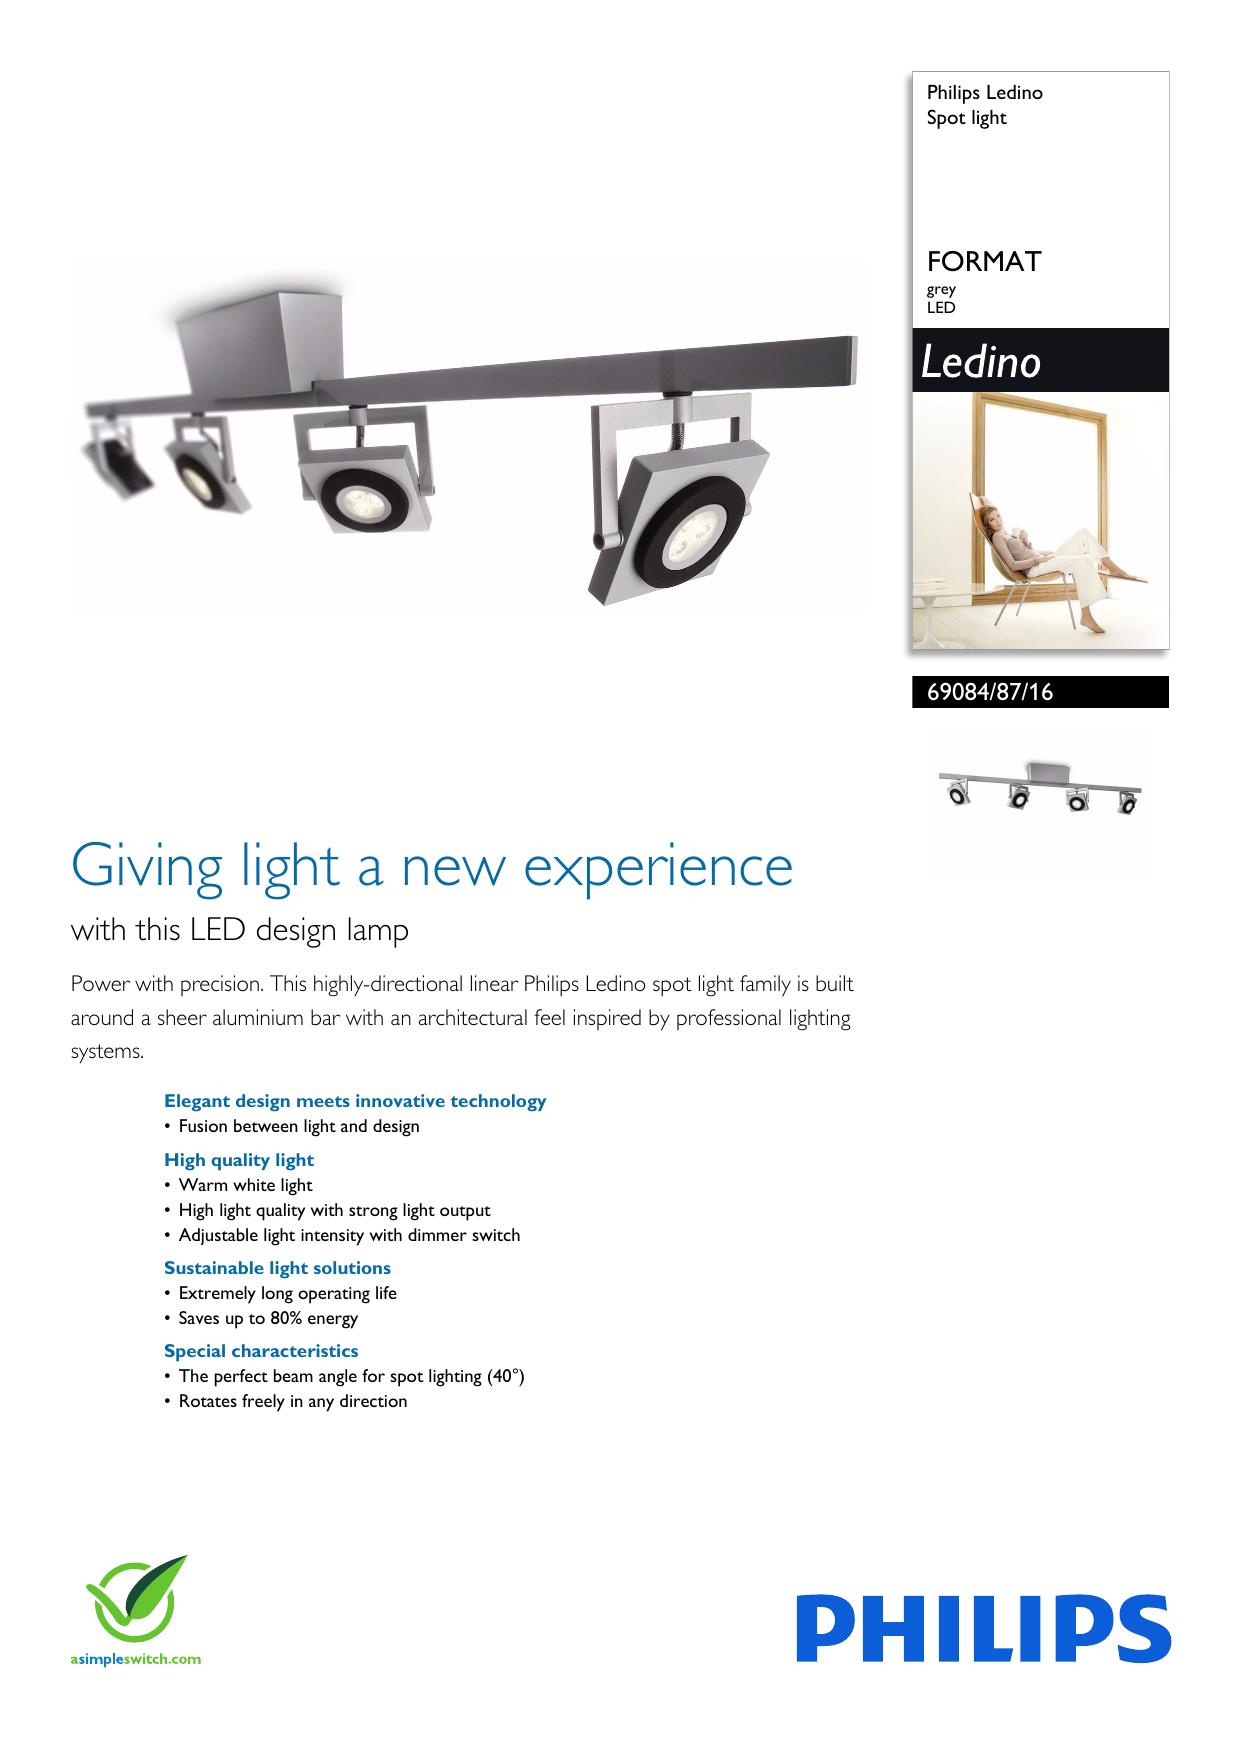 690848716 Philips Spot Light Manualzz